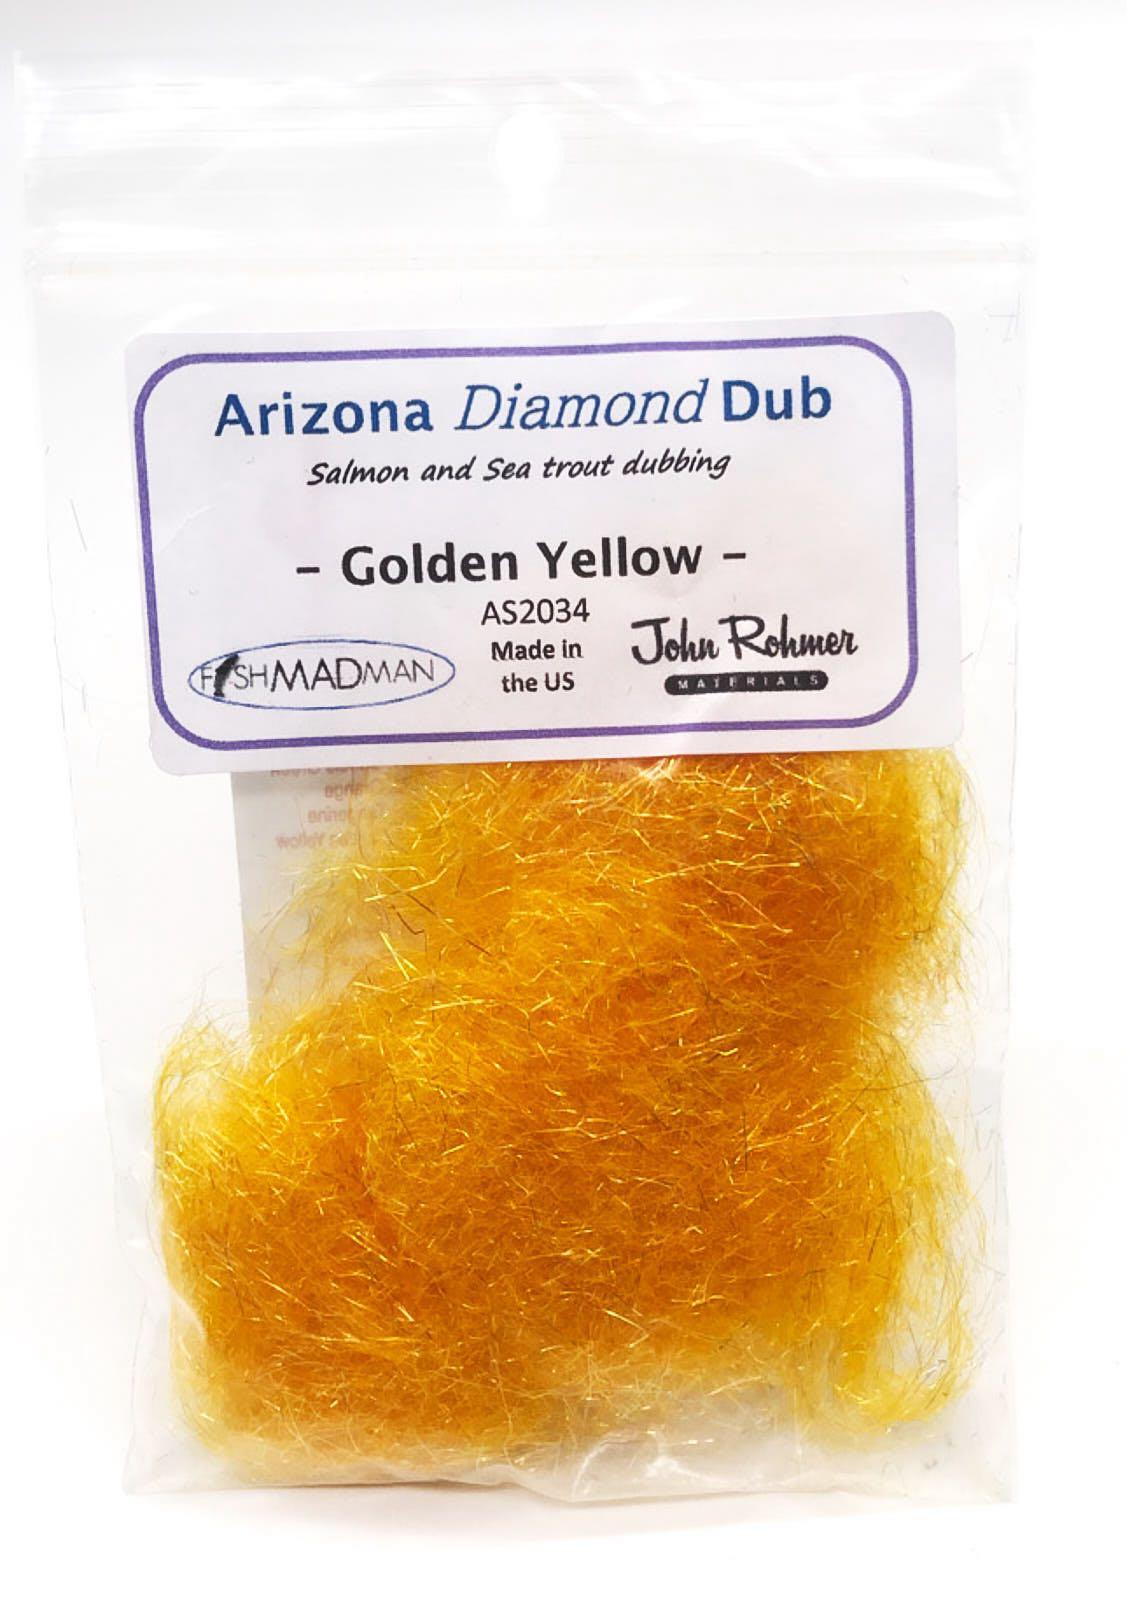 Arizona Diamond Dub Golden Yellow